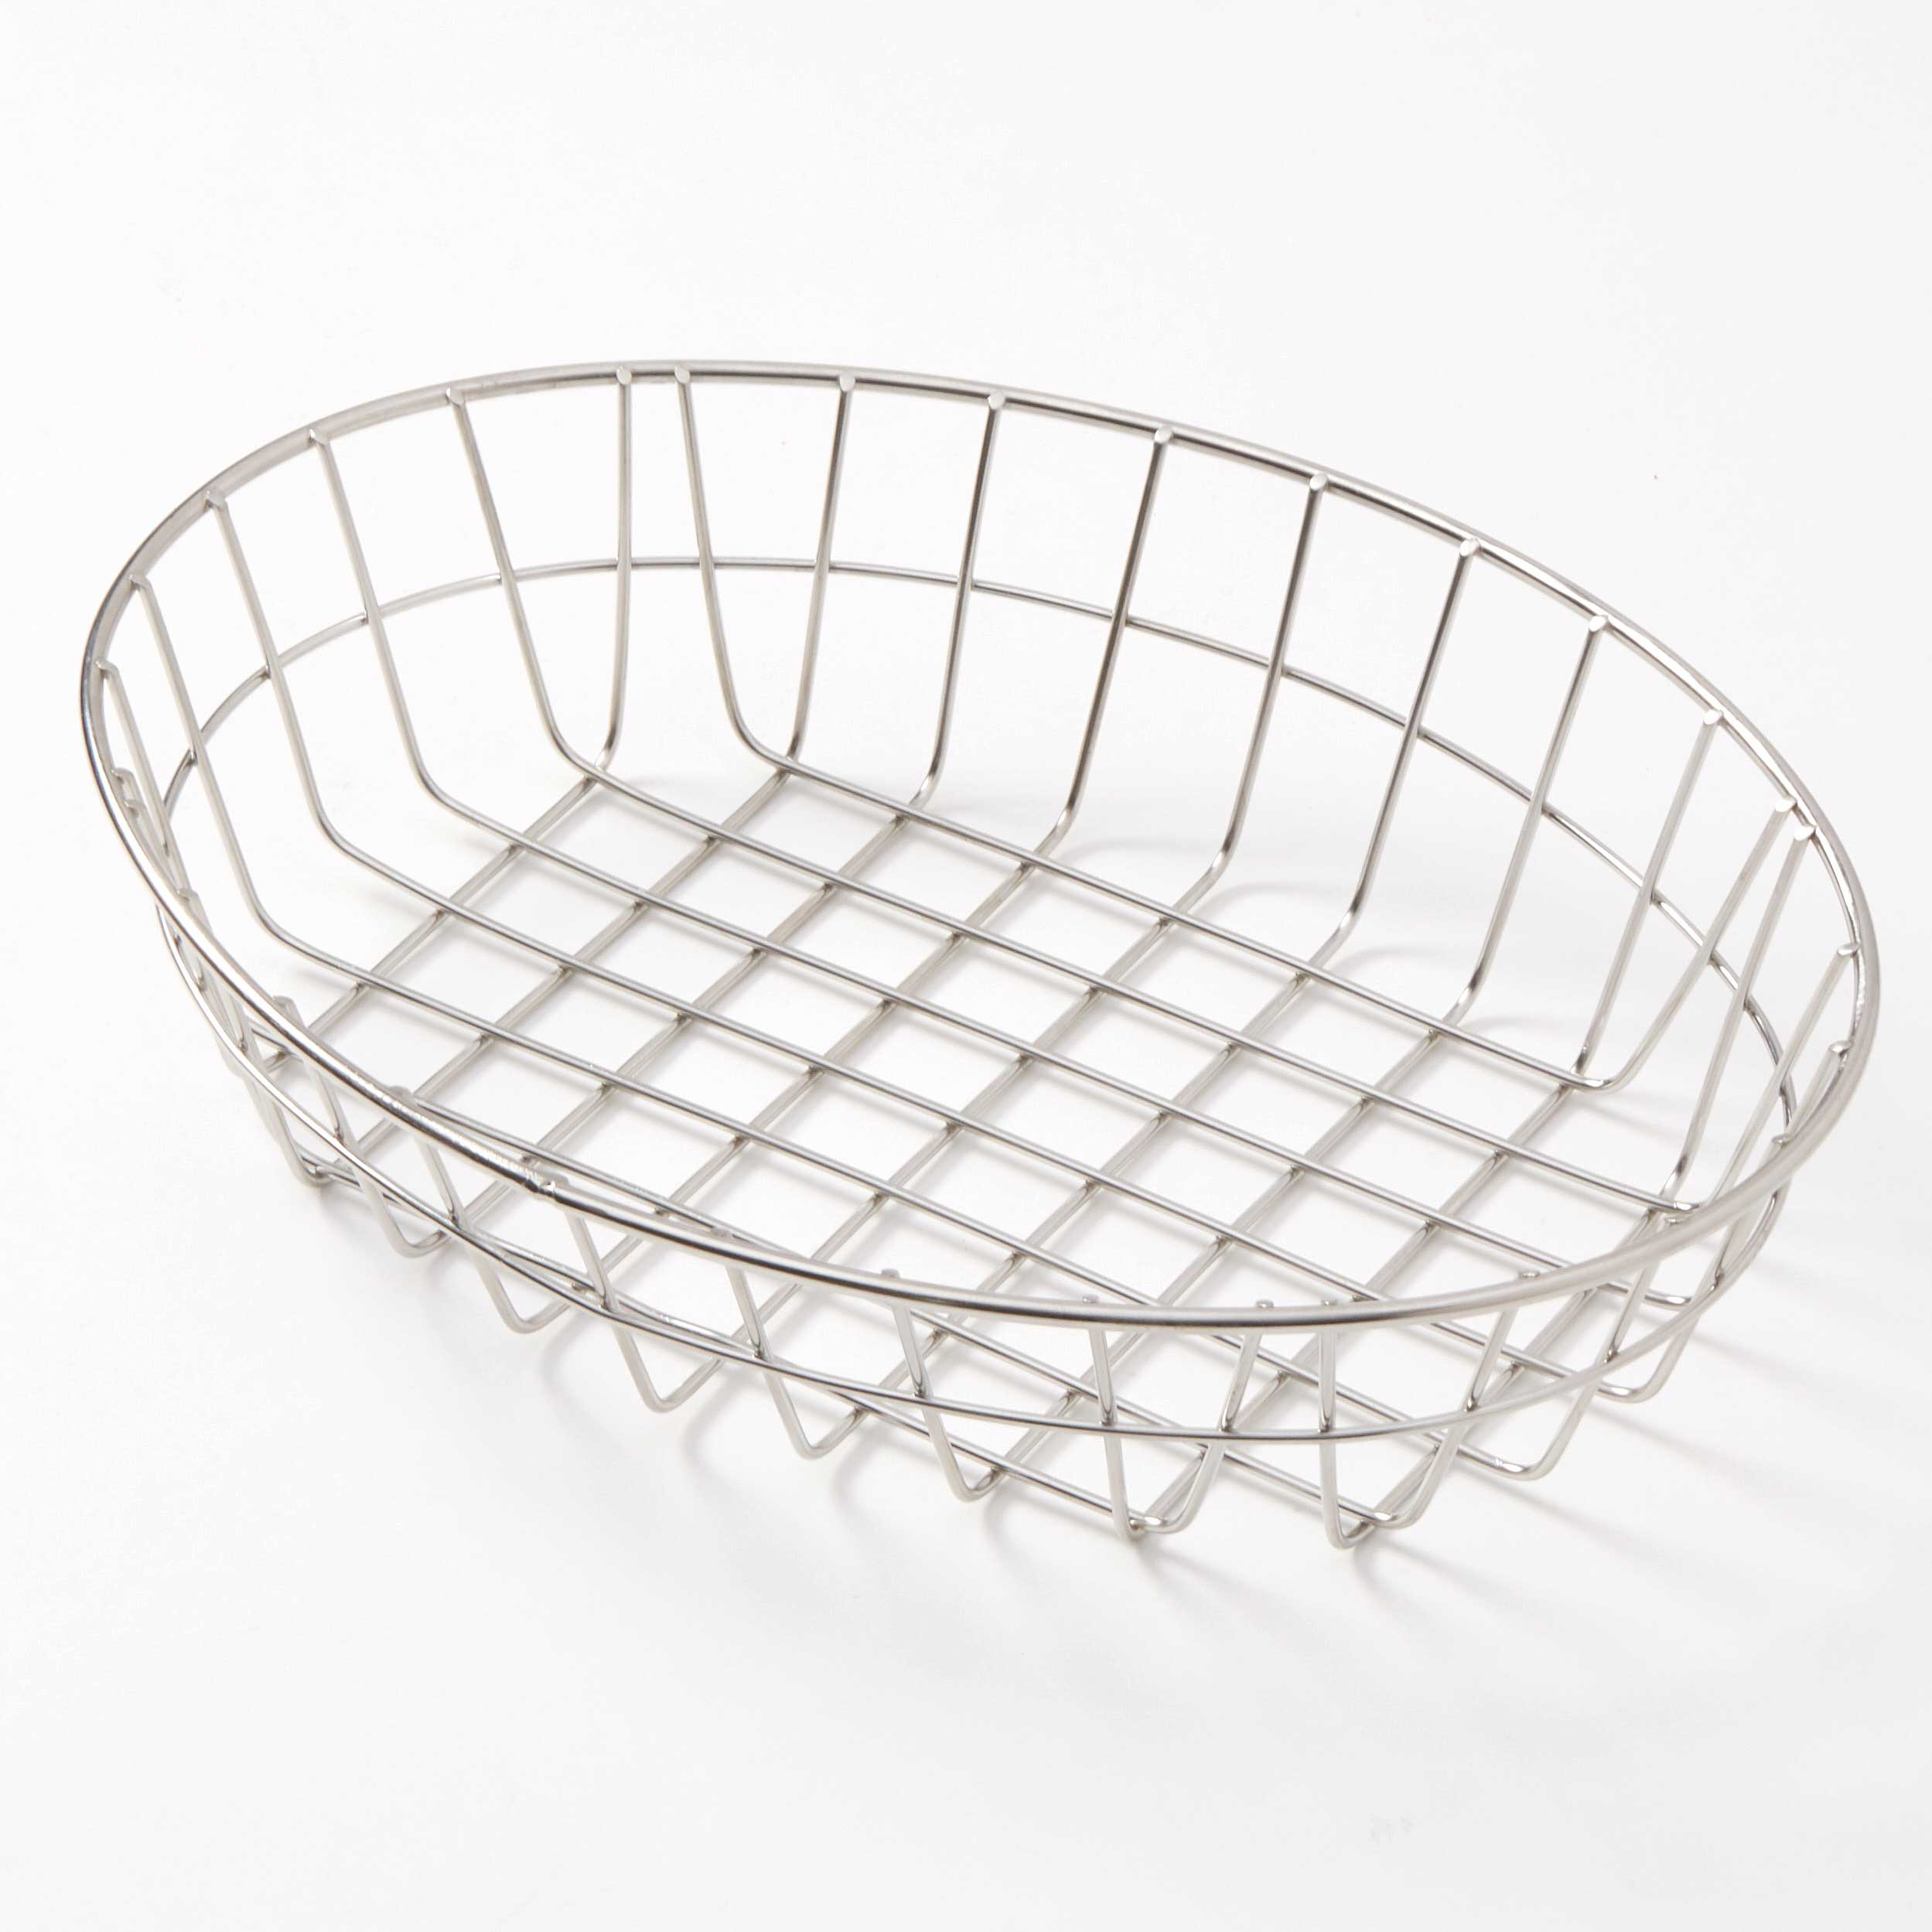 American Metalcraft GOVS811 basket, tabletop, metal